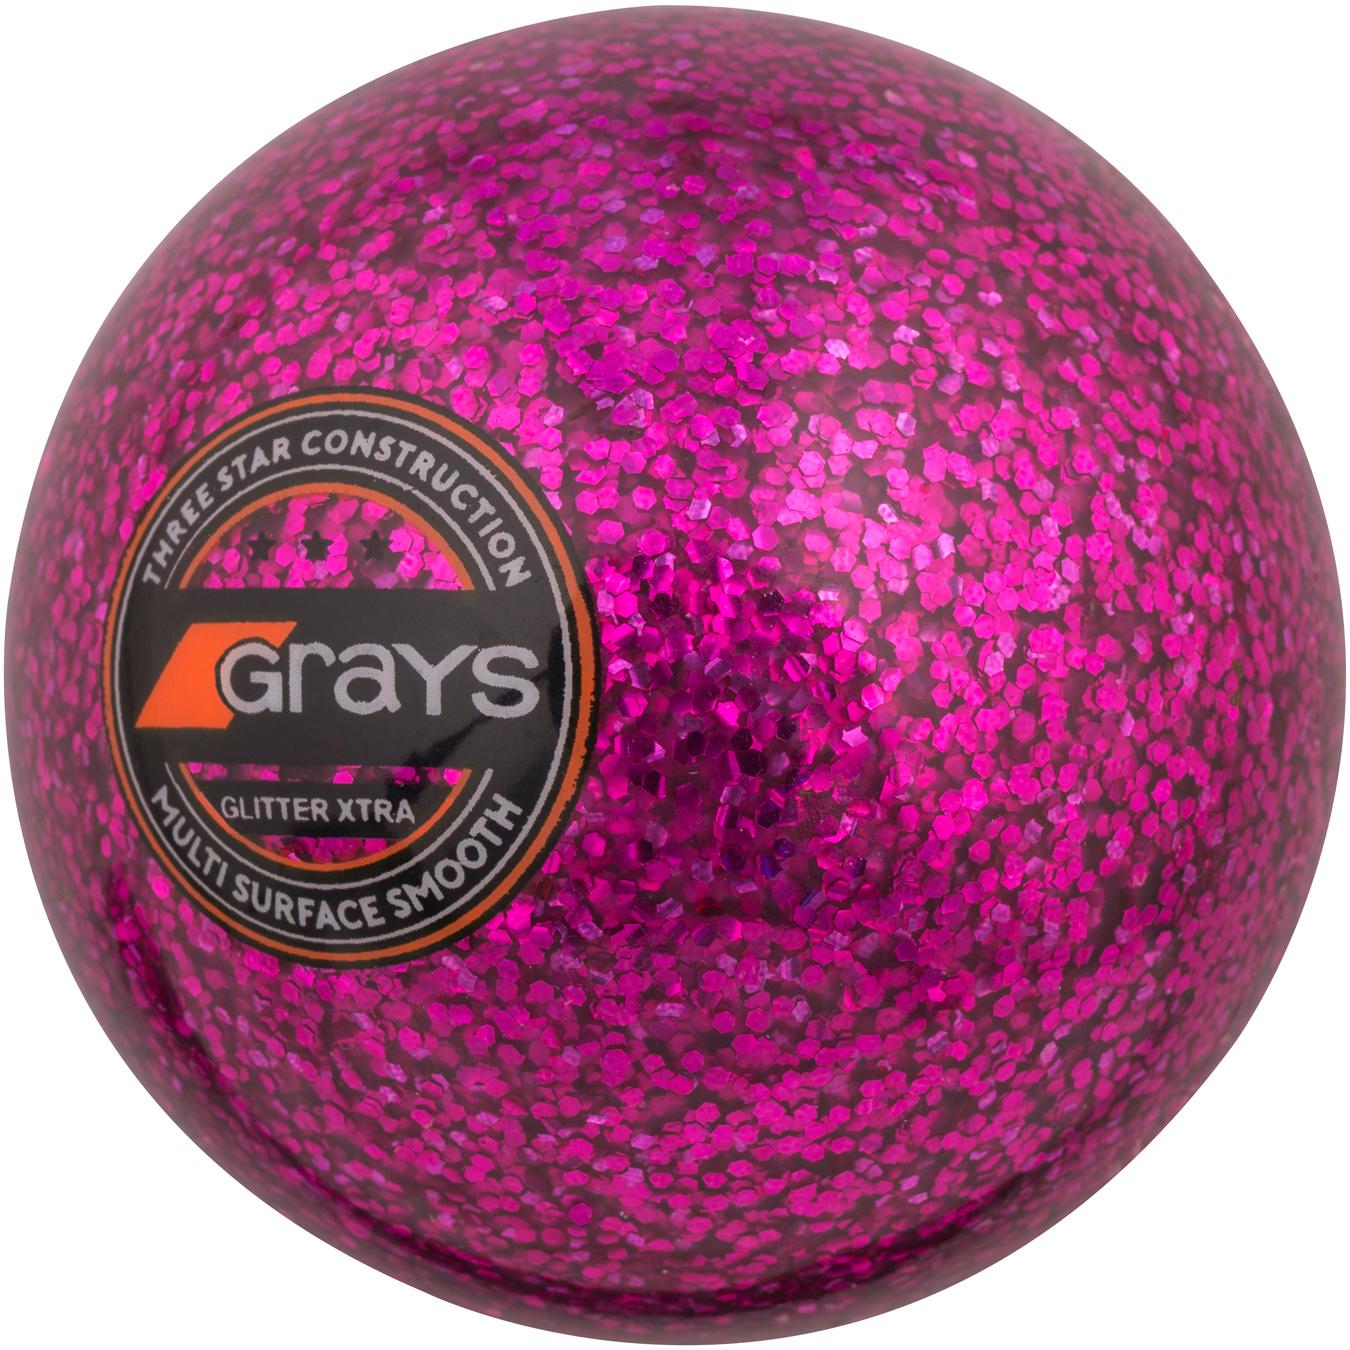 Grays Grays glitter bal roze